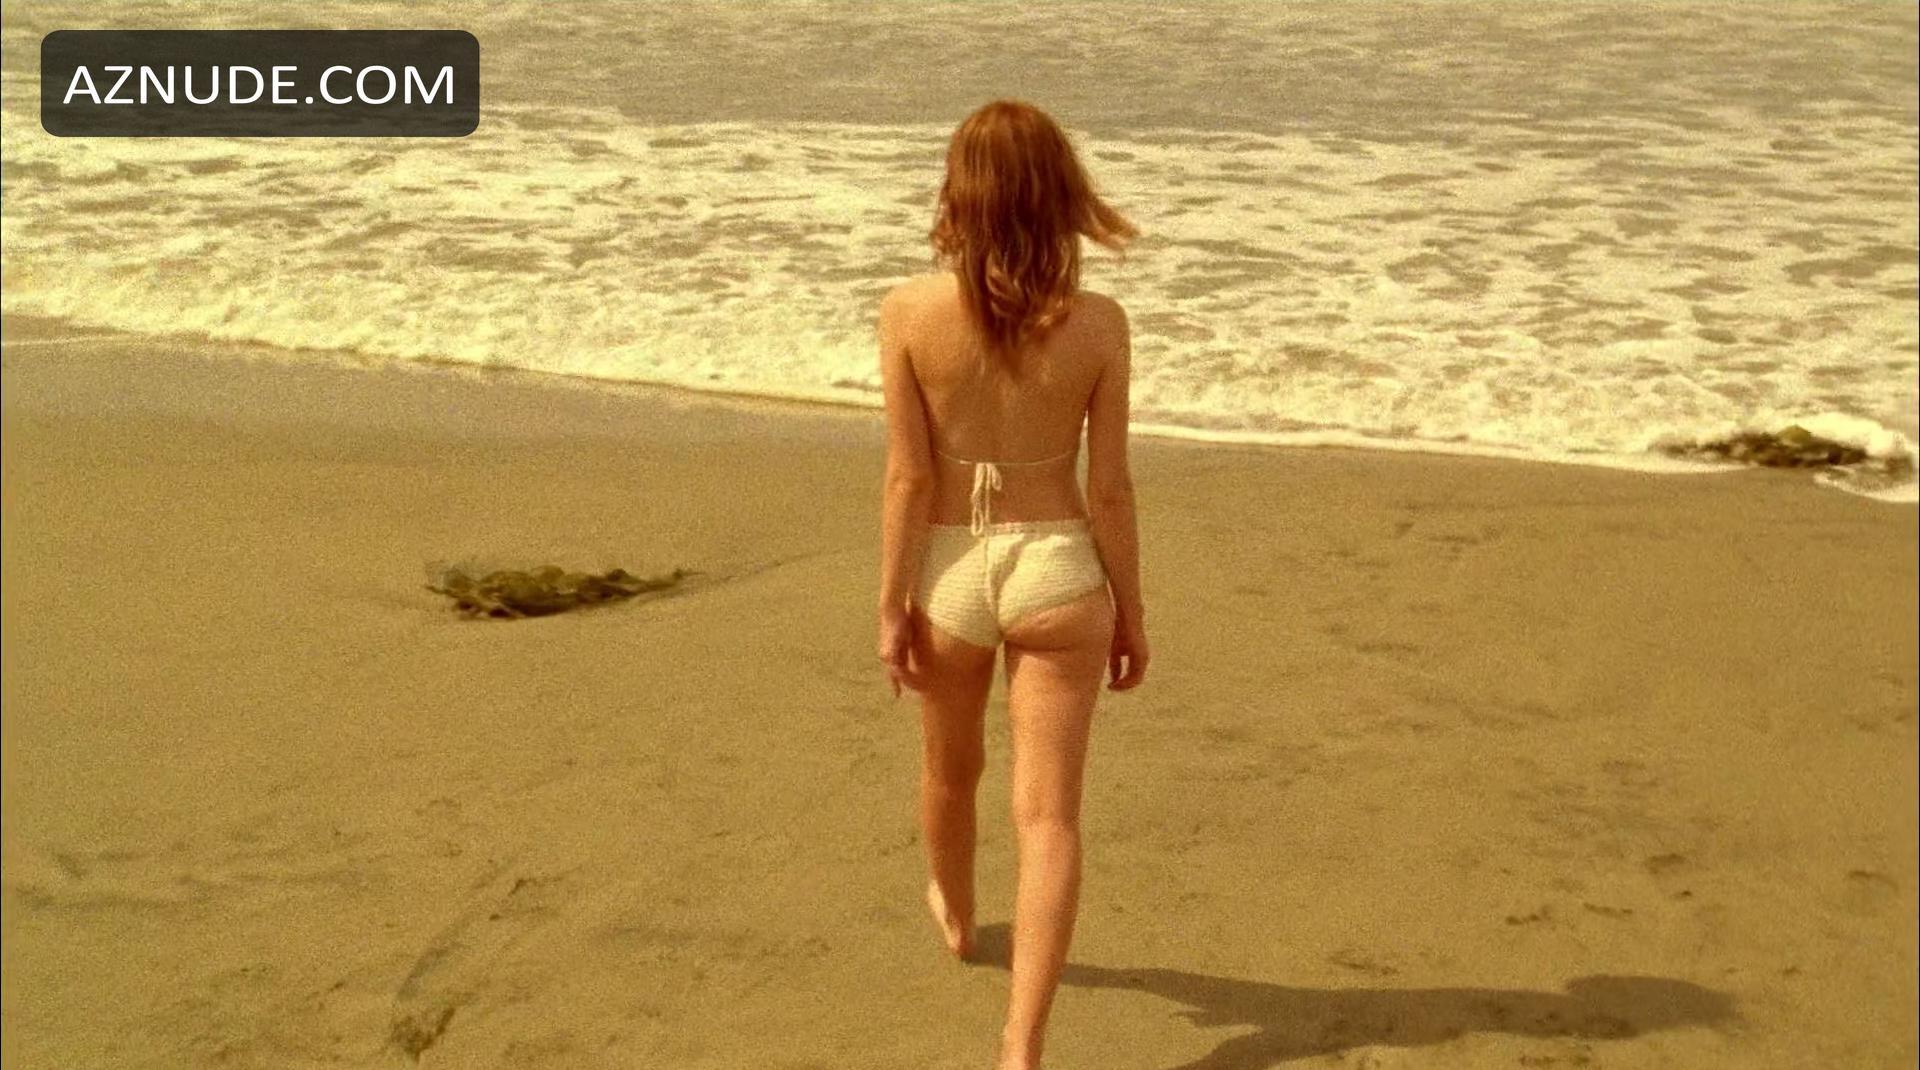 Agree, the Az nudist shangrila casually come